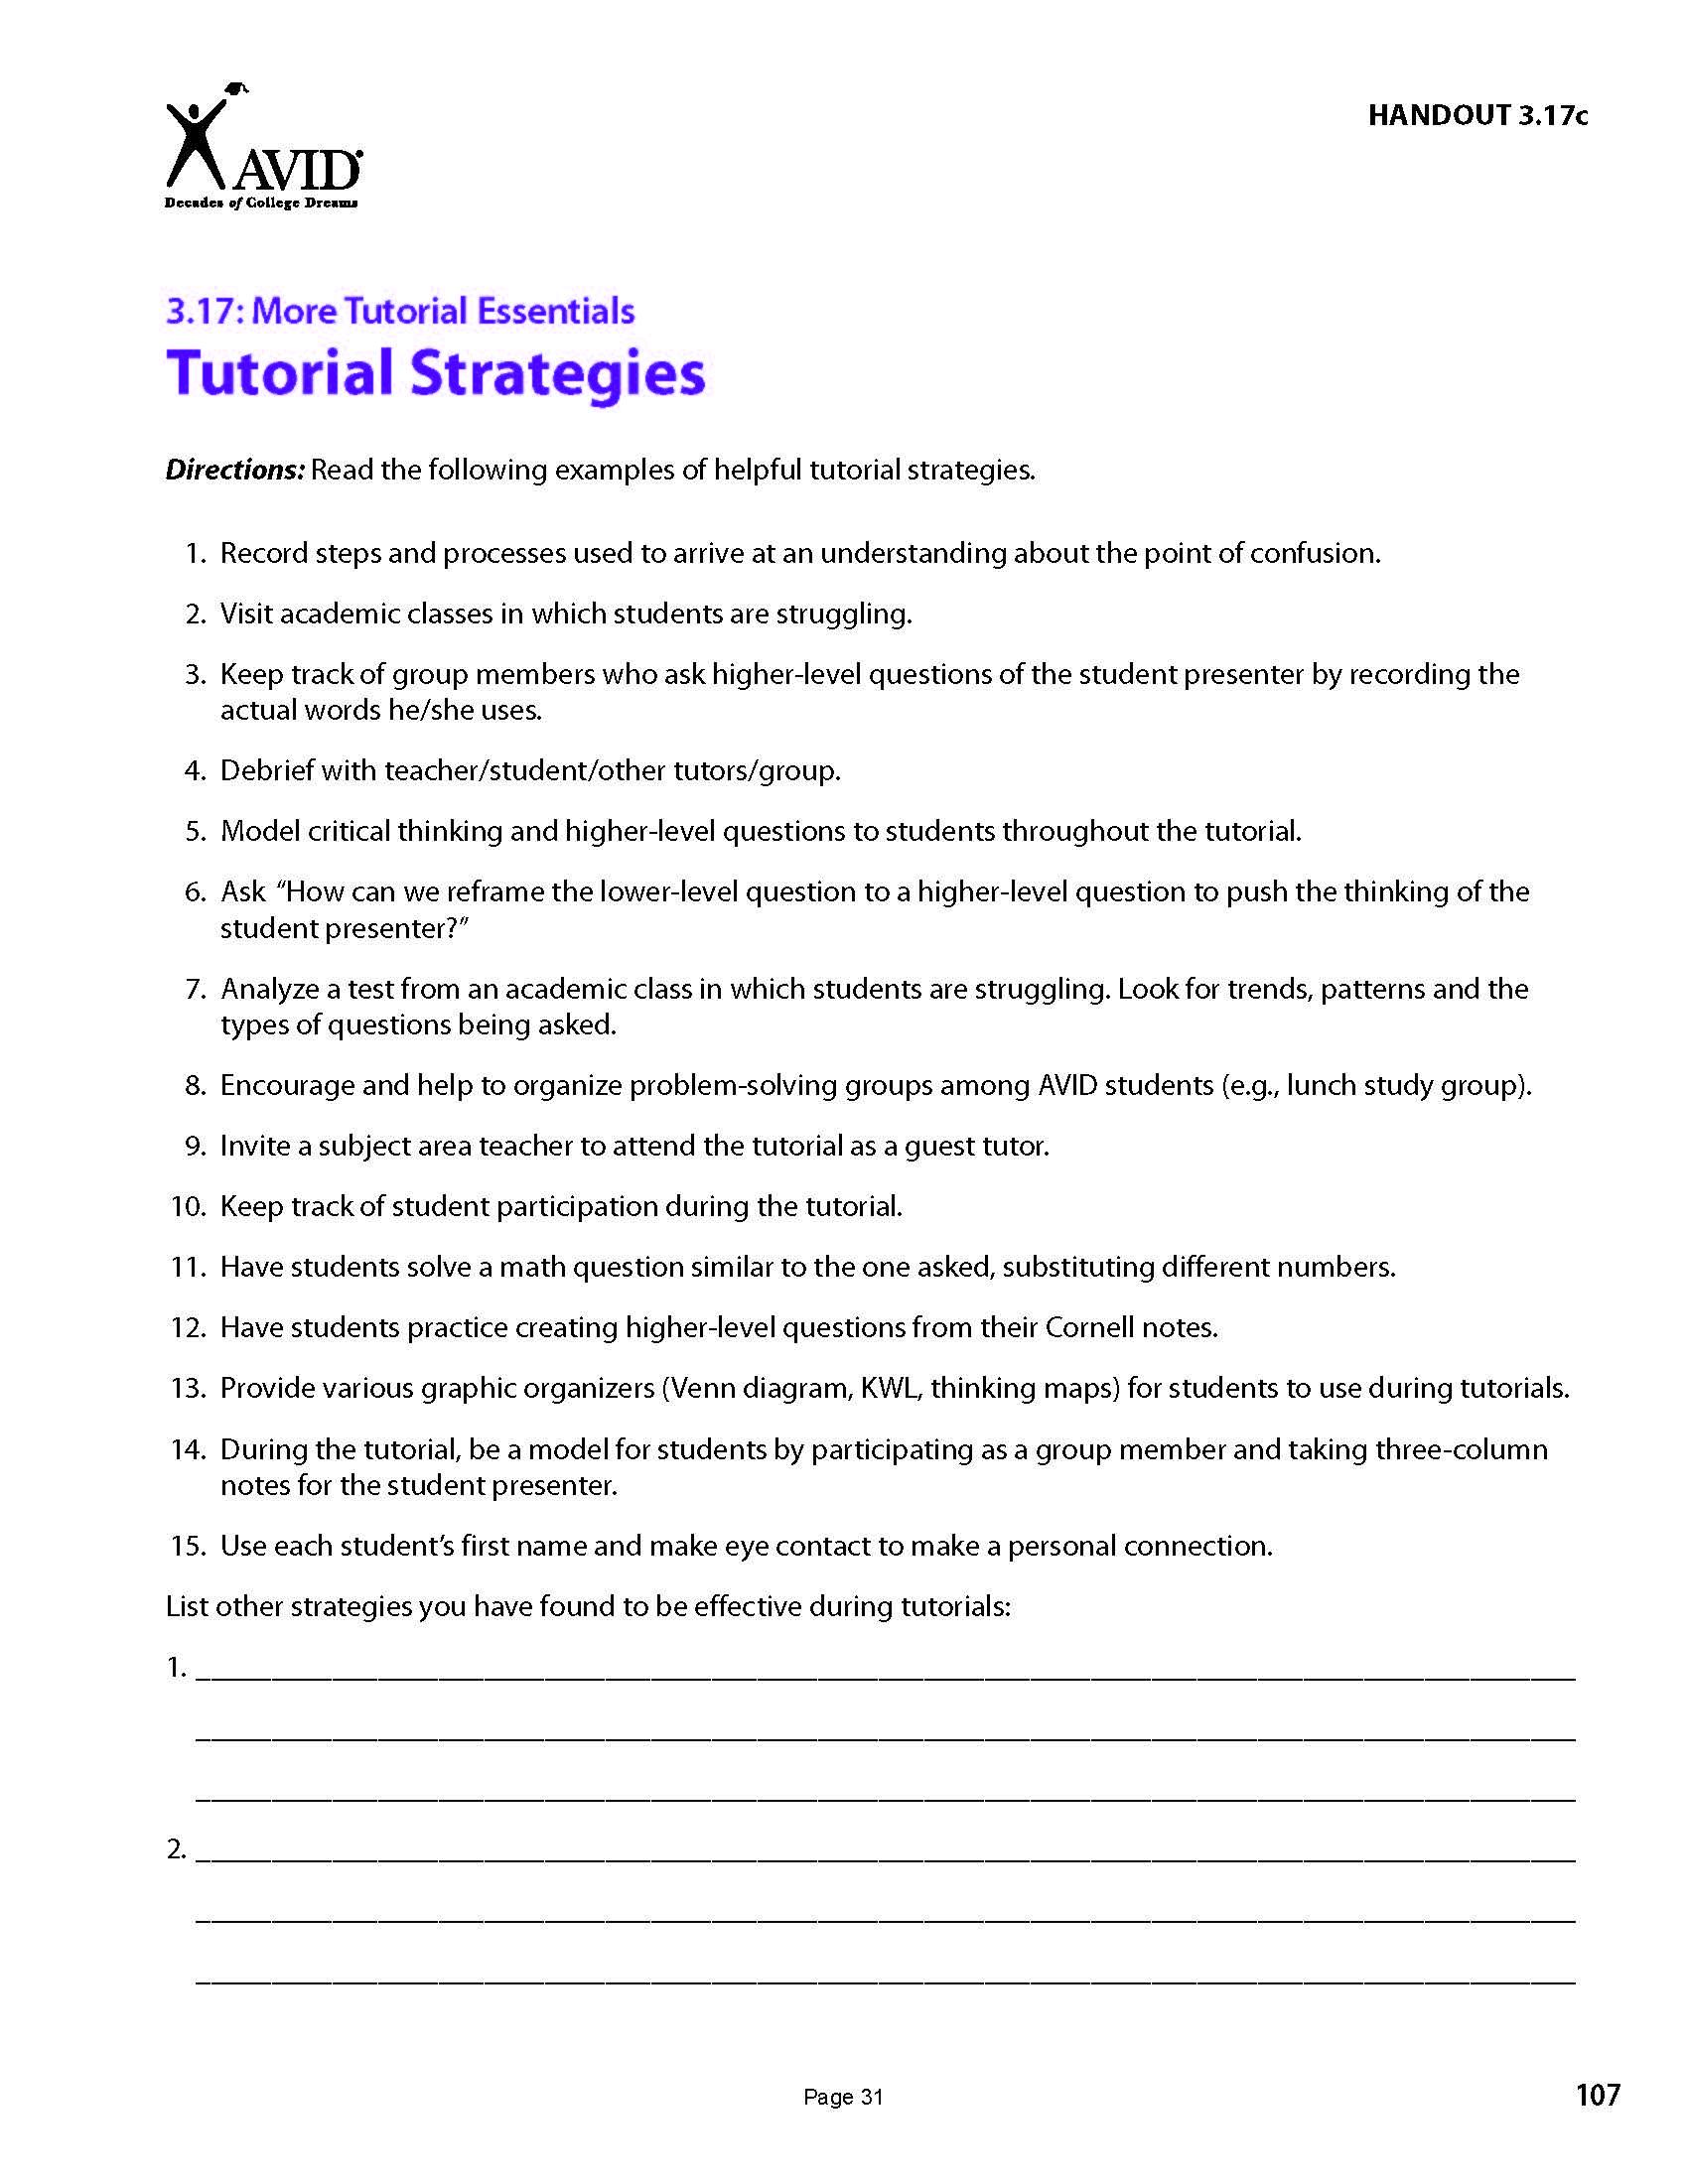 CATIA tutorials for beginners.